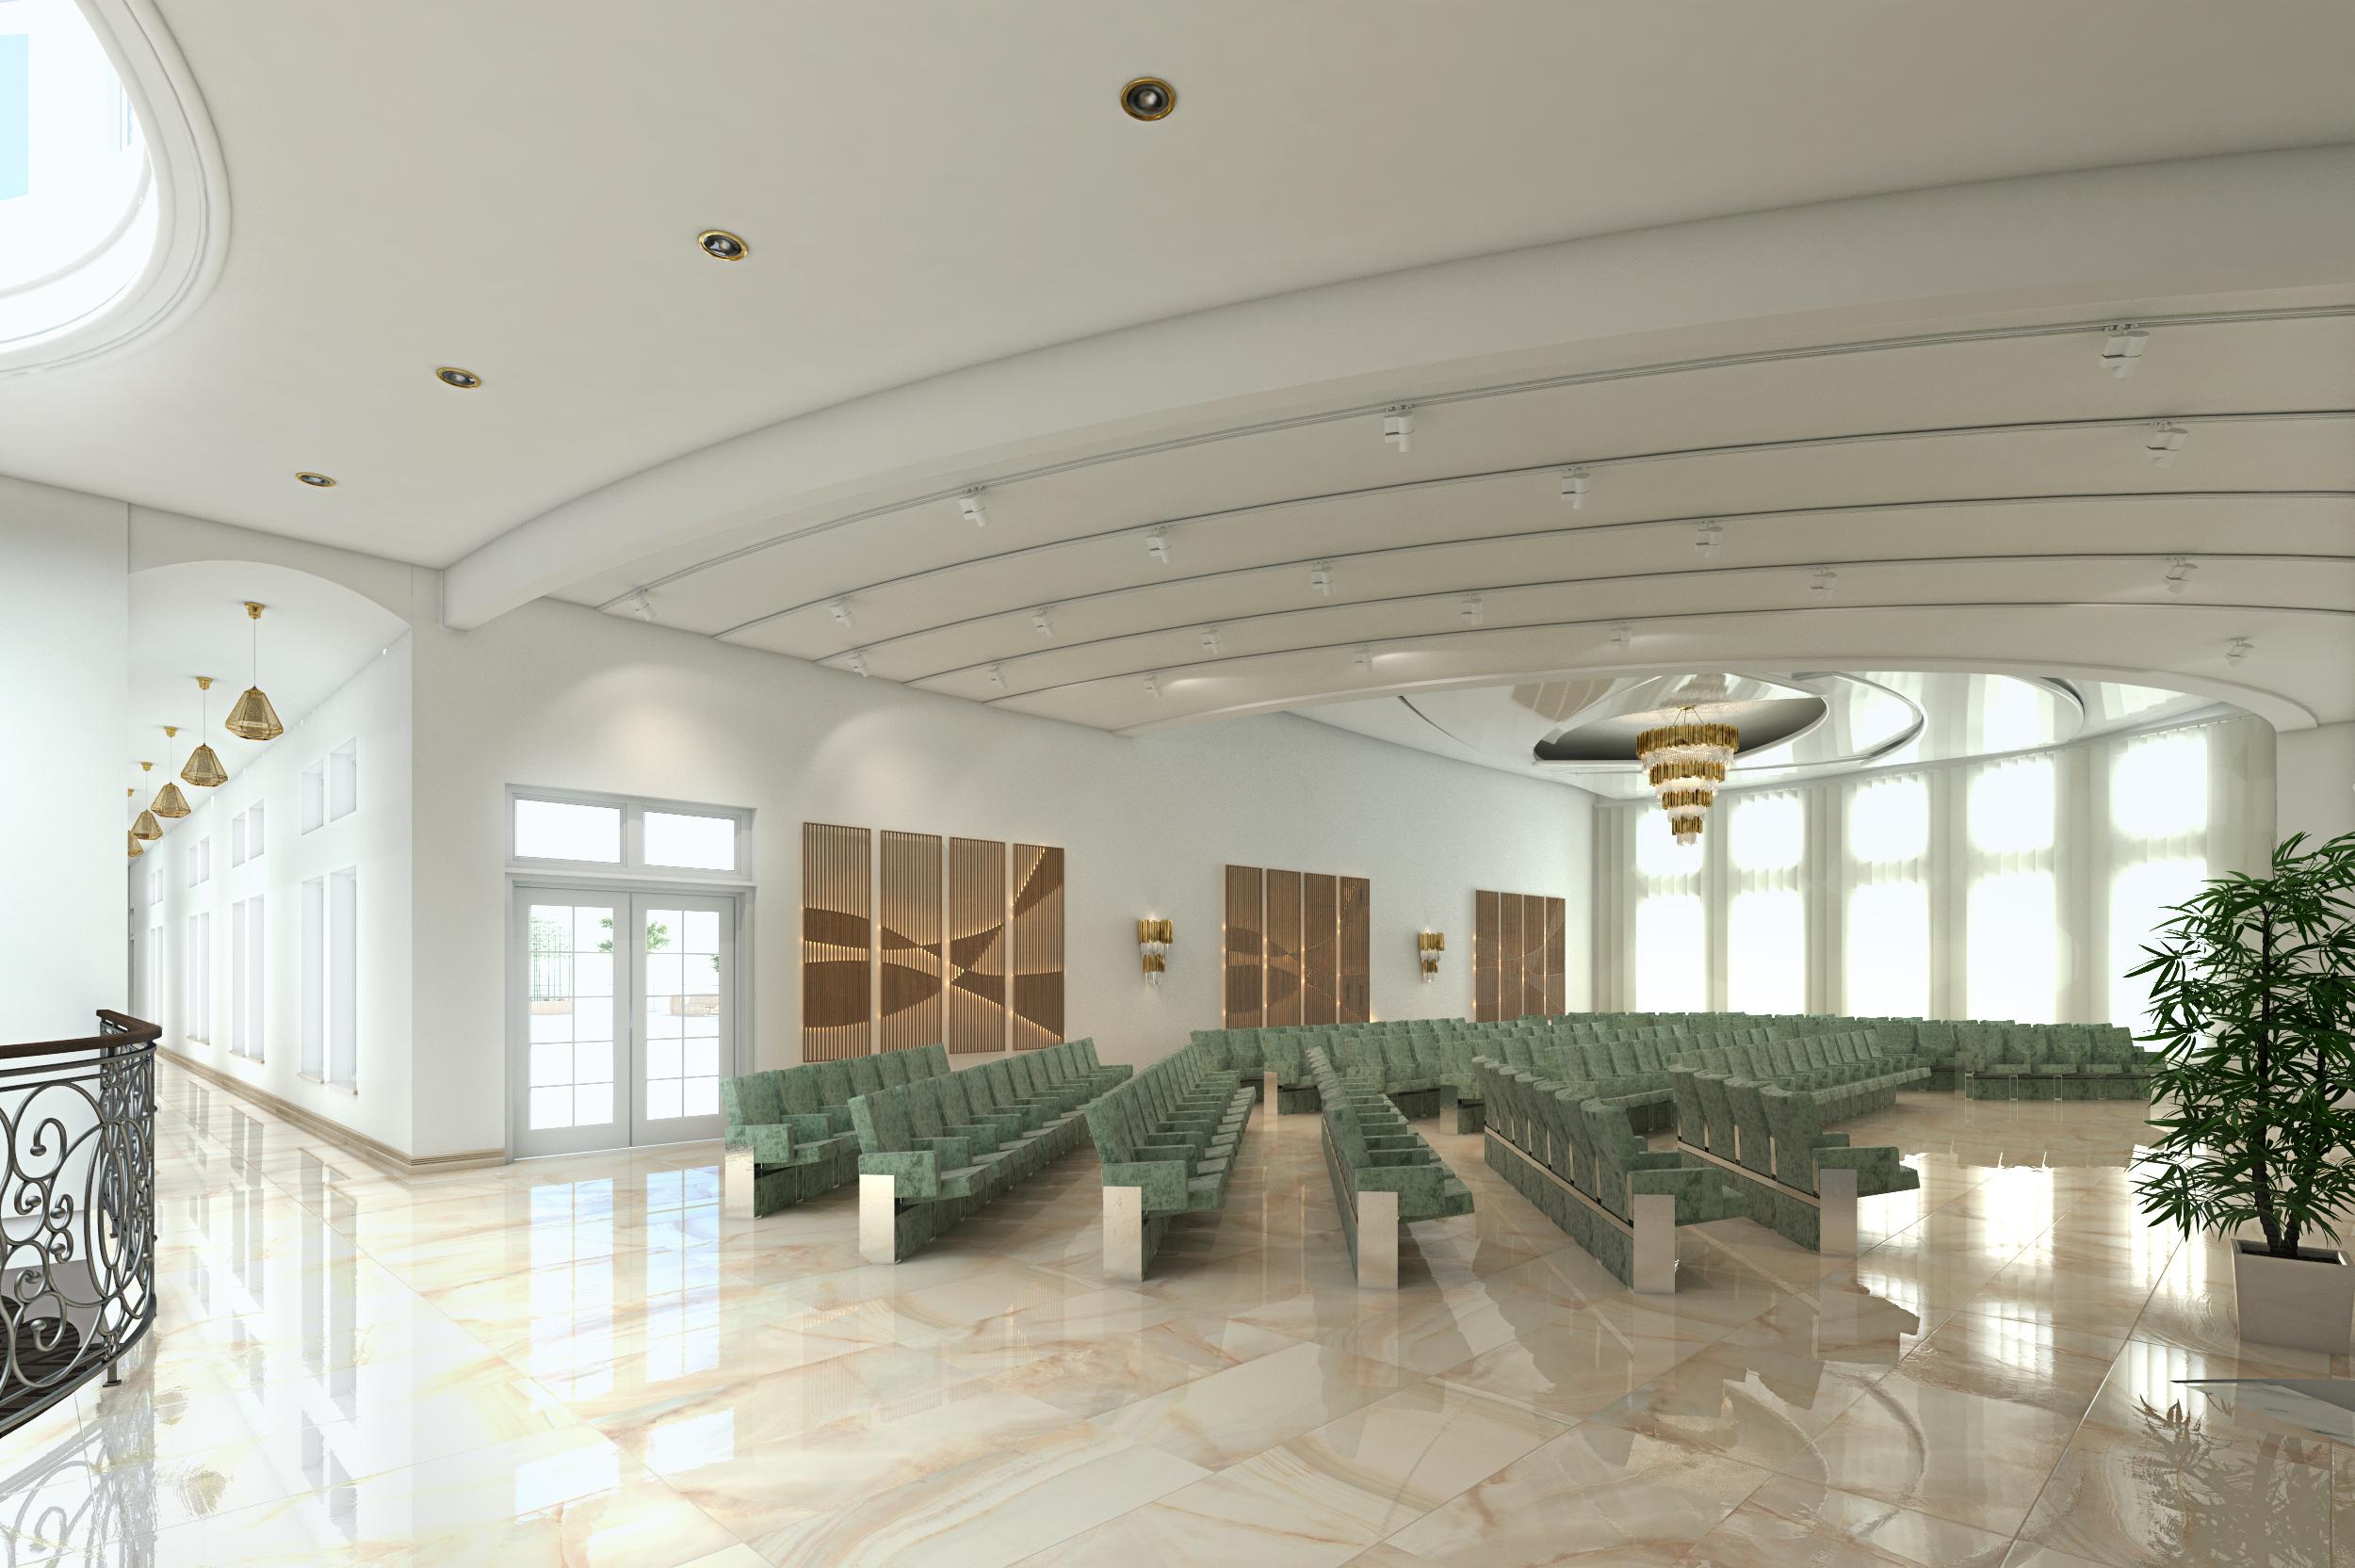 India Center, Bruce Hamilton Architects